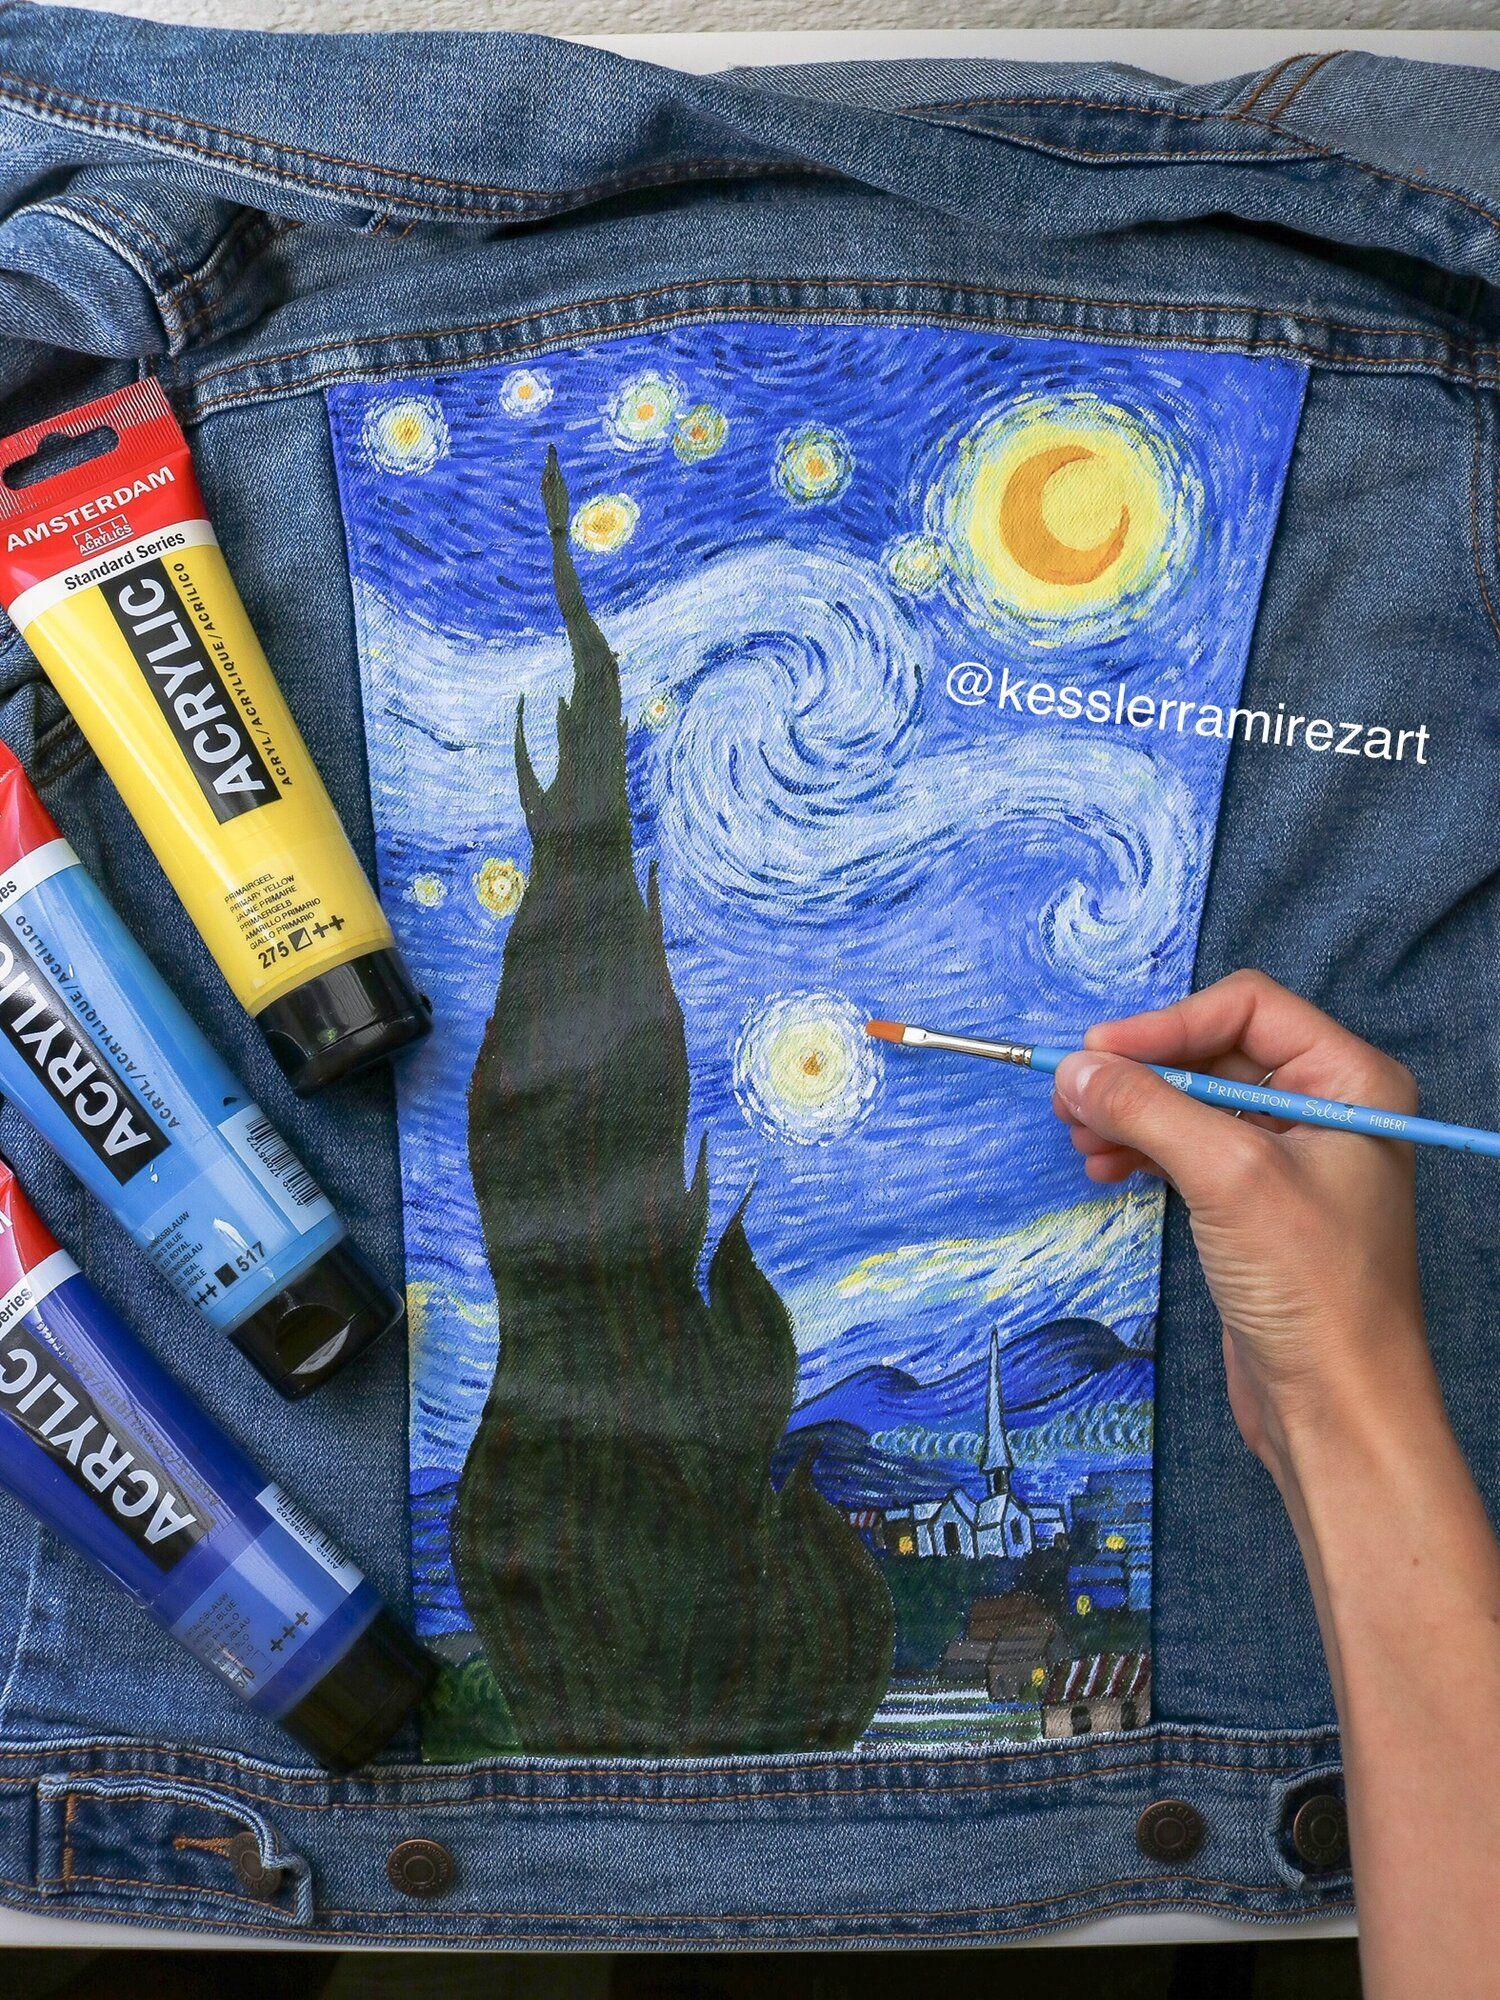 Denim painting 101 paint and supplies kessler ramirez